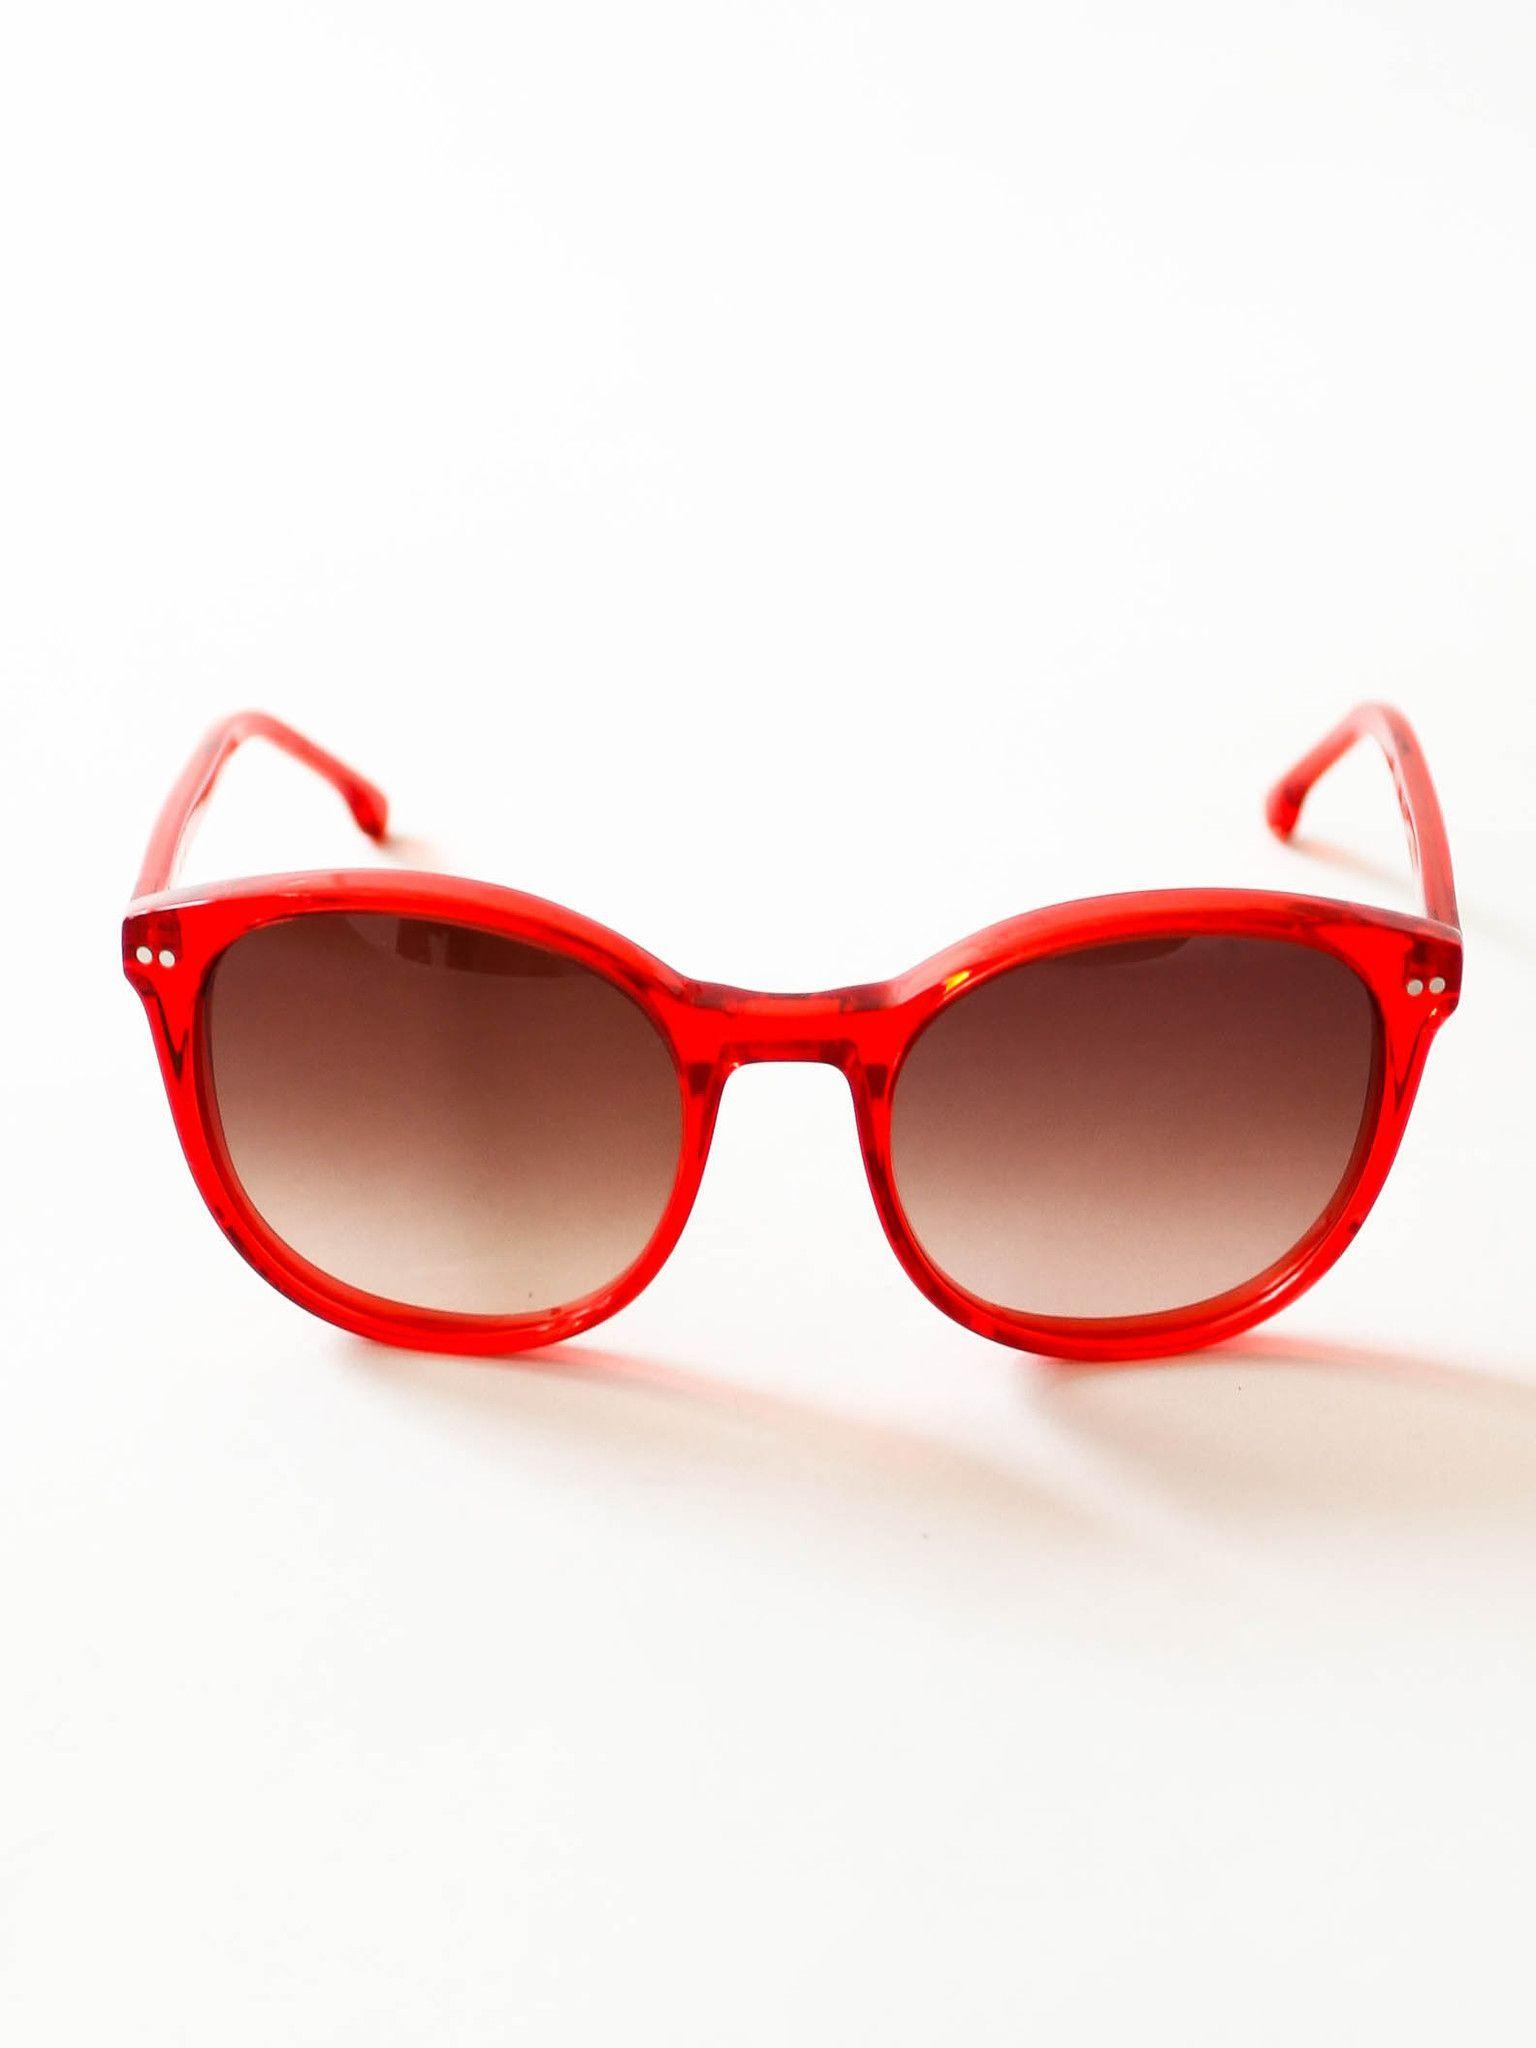 d4c2c84b29b Steven Alan Optical George Sunglasses - Bright Red Crystal